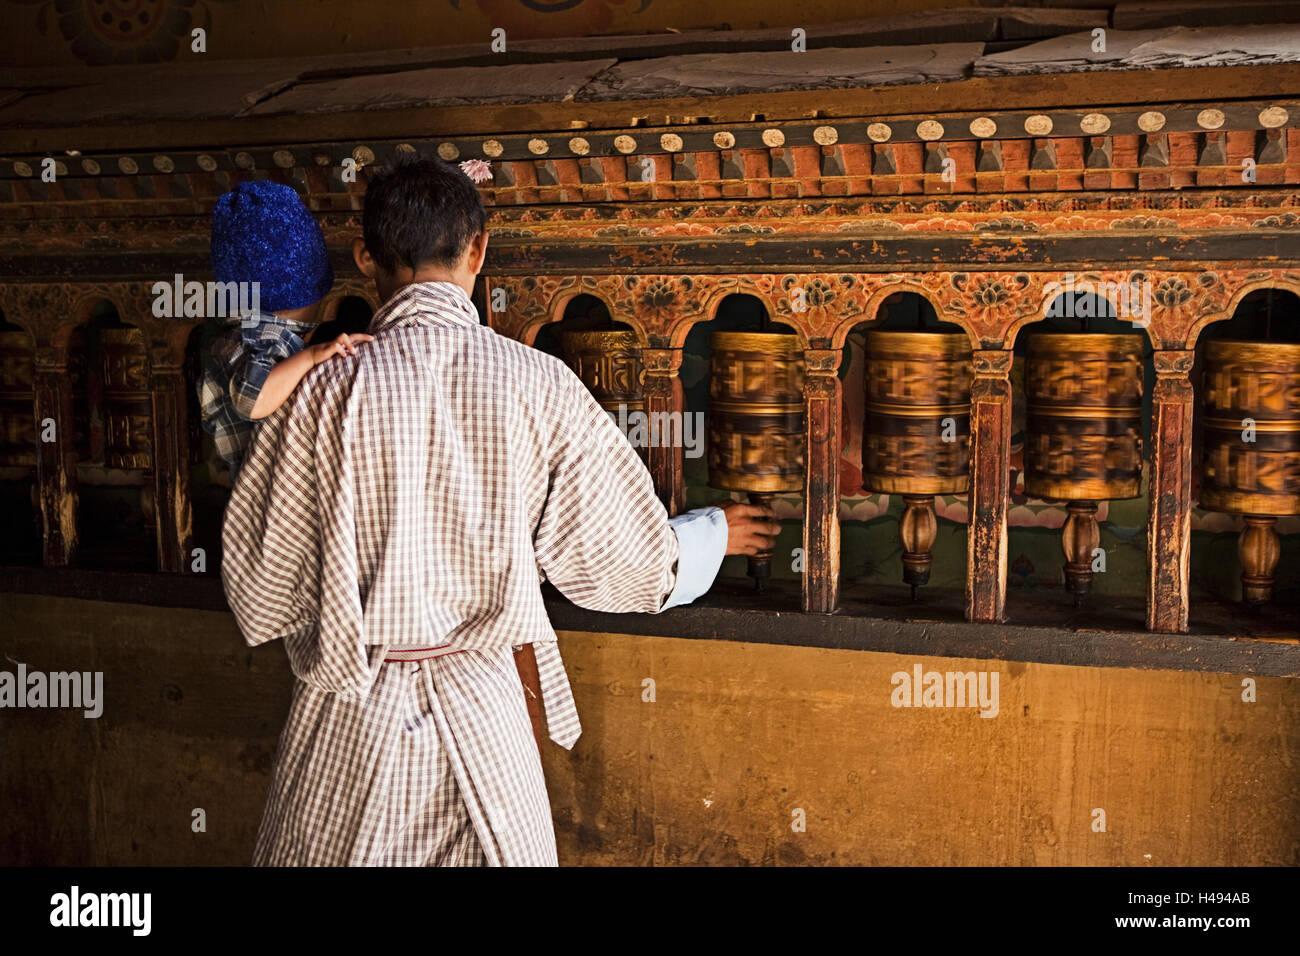 Kingdom of Bhutan, Buddhist, prayer mills, - Stock Image